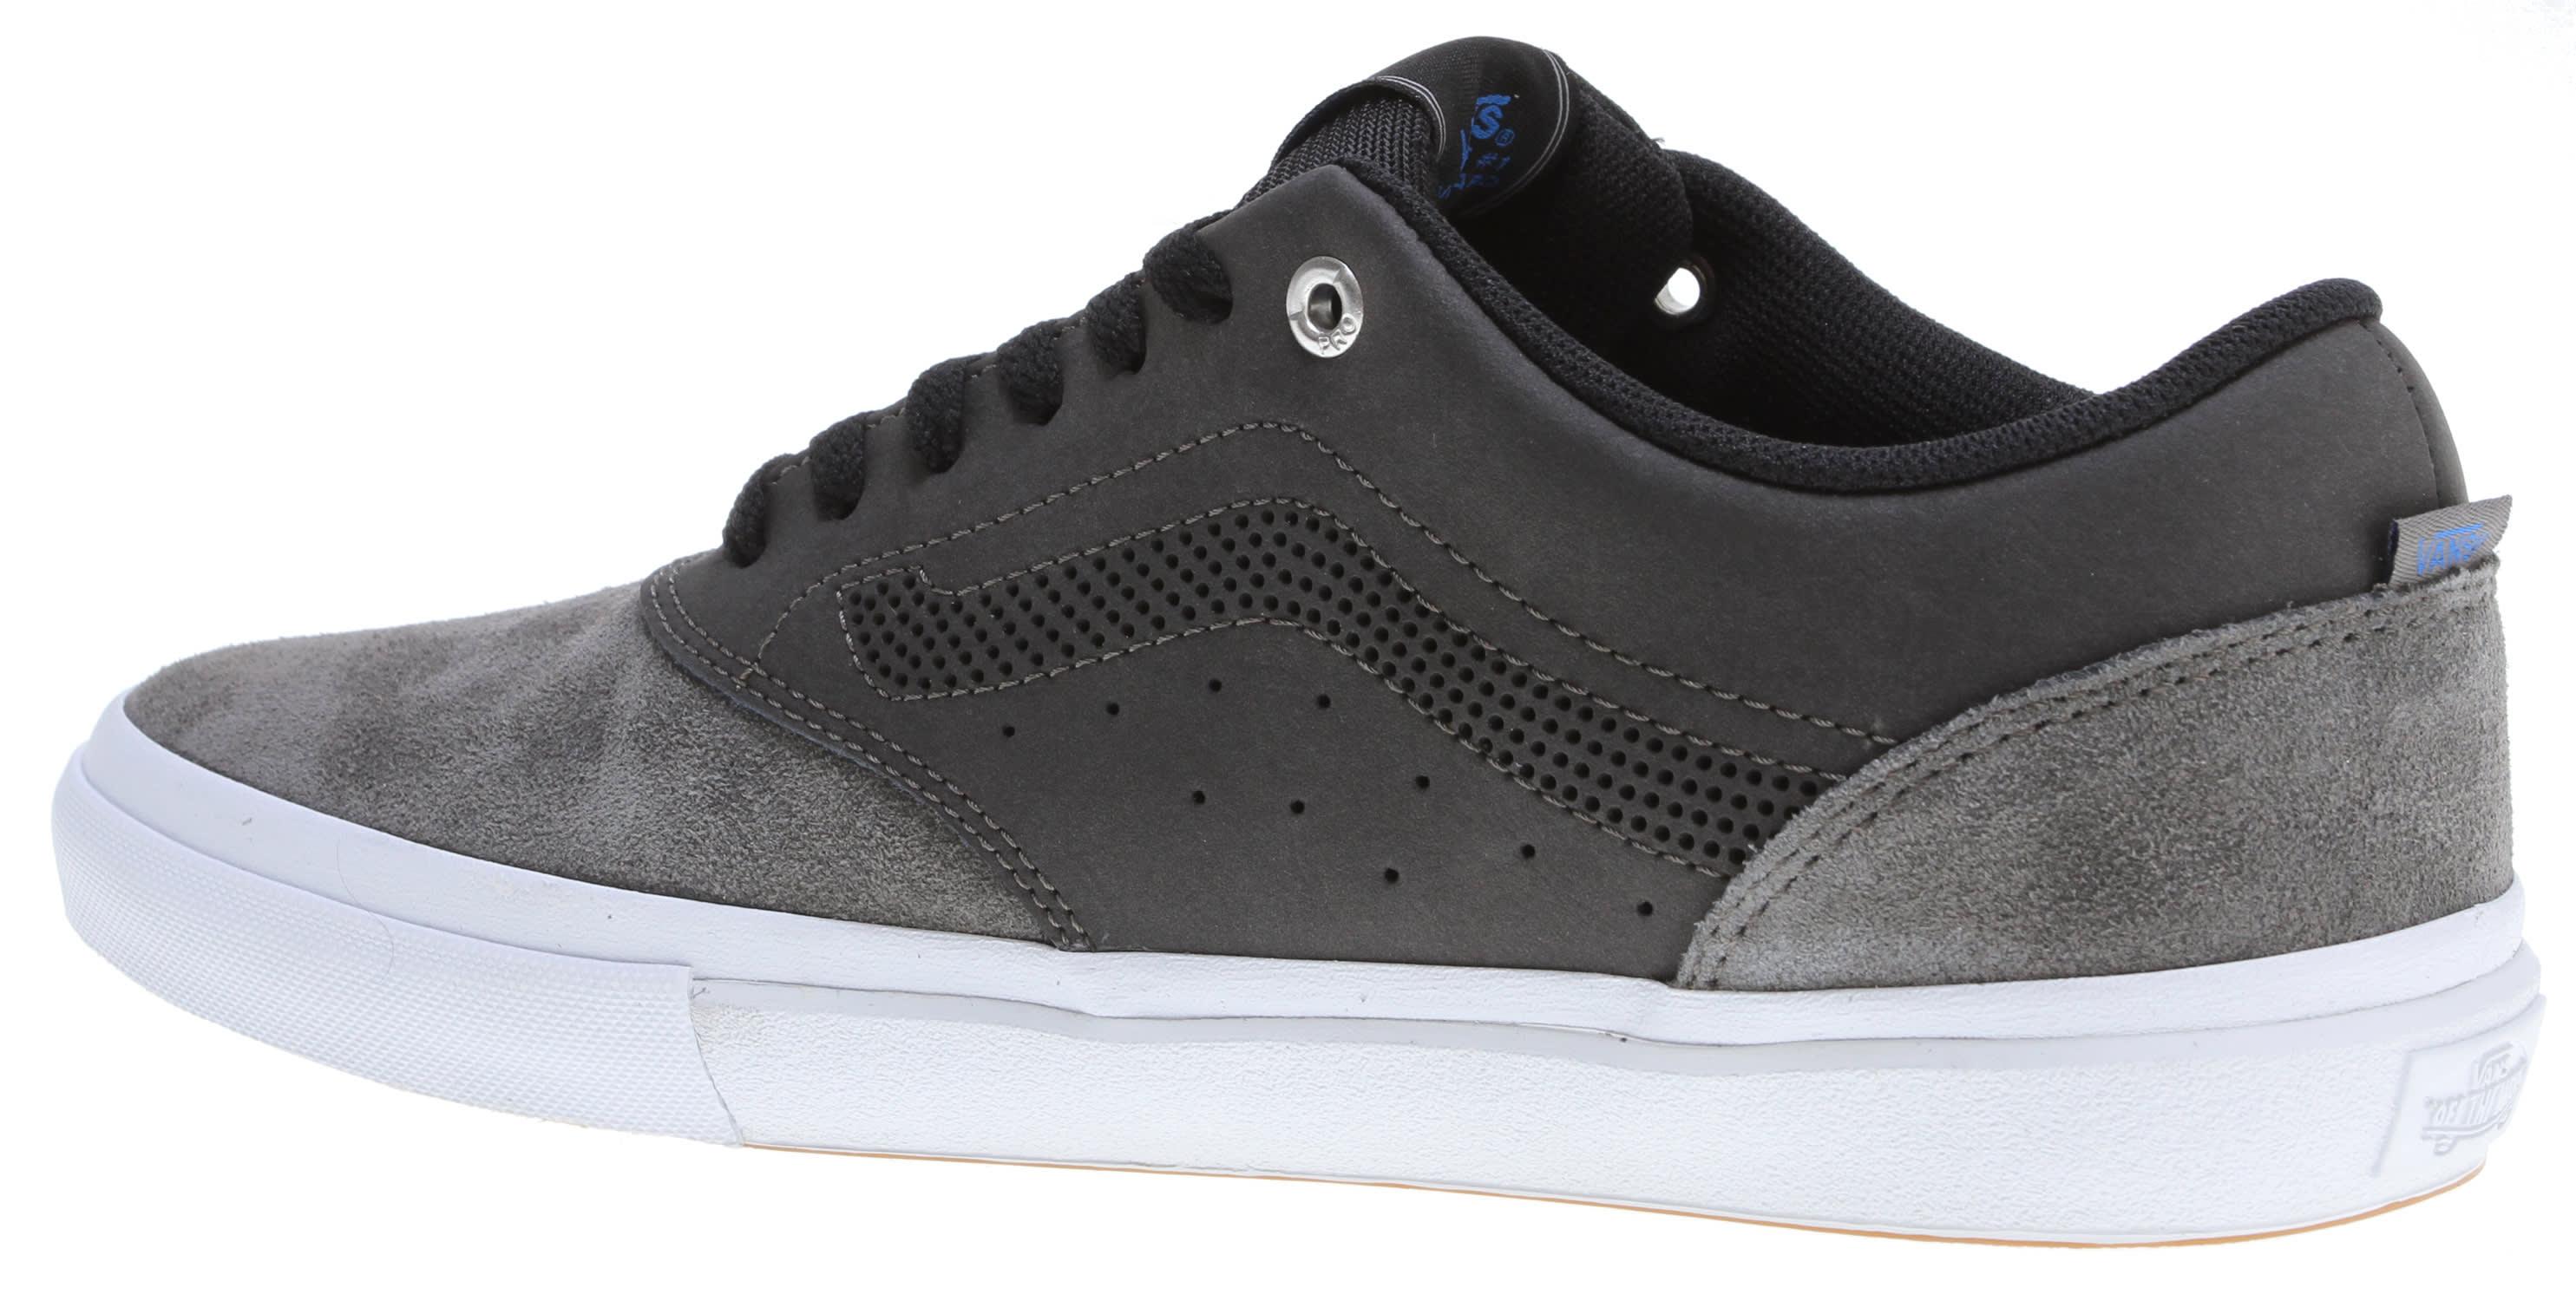 73444e5da9f1 Vans Euclid Skate Shoes - thumbnail 3